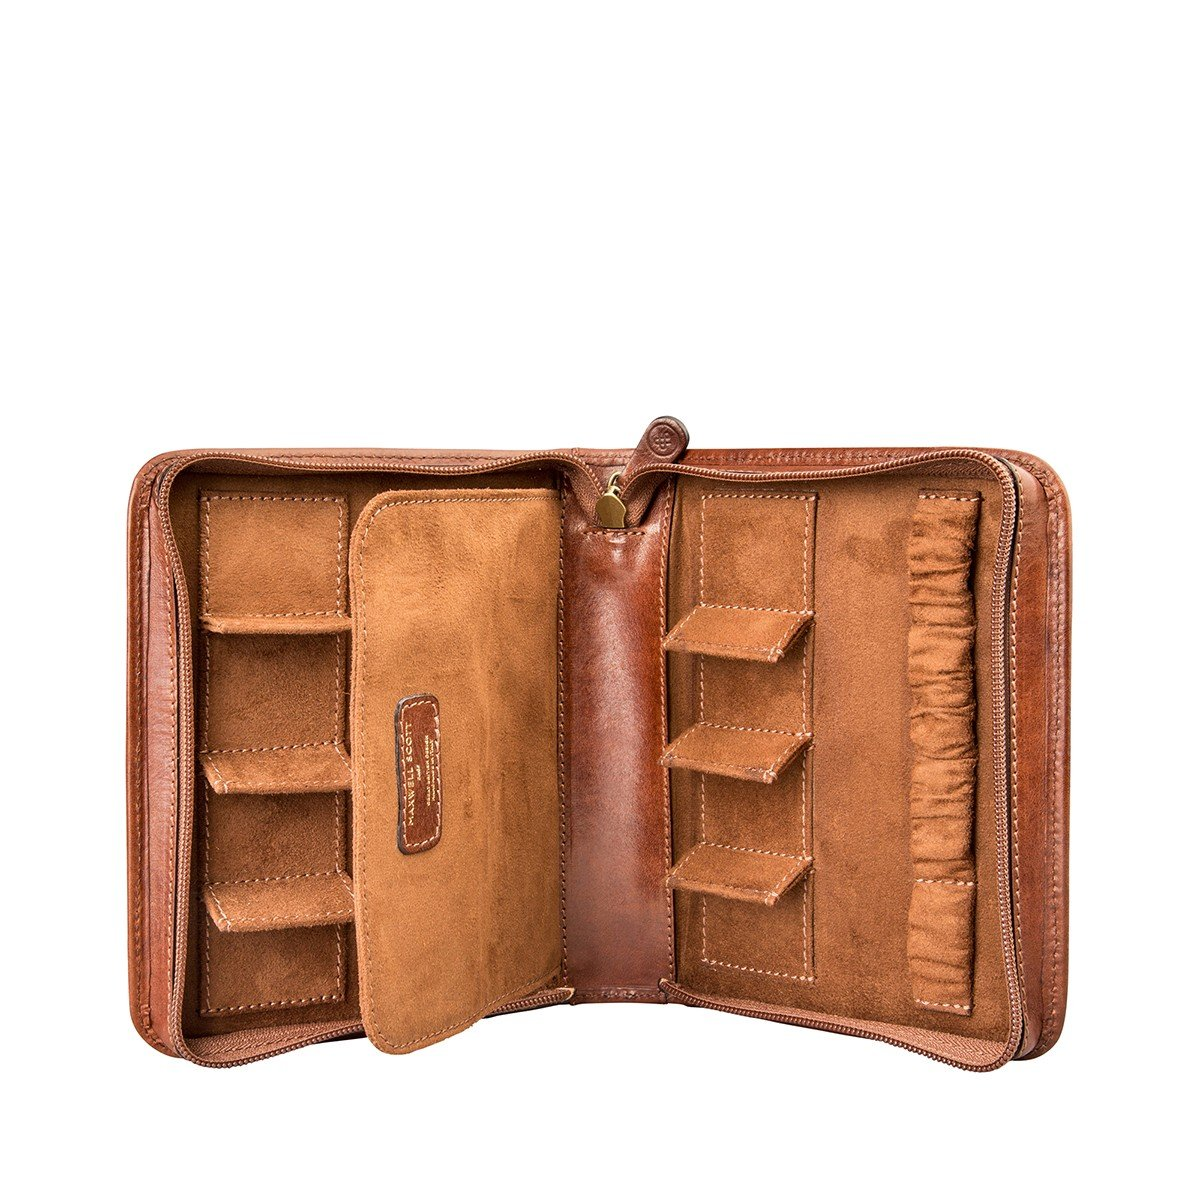 Maxwell Scott Bags® Cognac Braune Leder Uhrenschatulle (Atella)